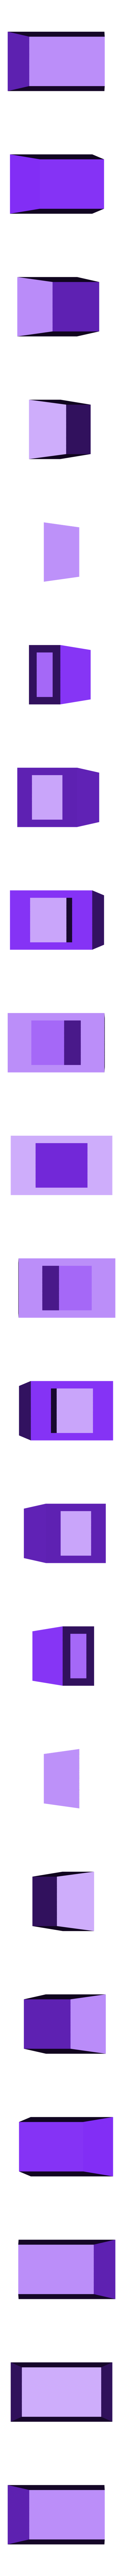 Leg_Lower_Deco_2X.STL Download STL file Low Poly Optimus Prime • Model to 3D print, biglildesign